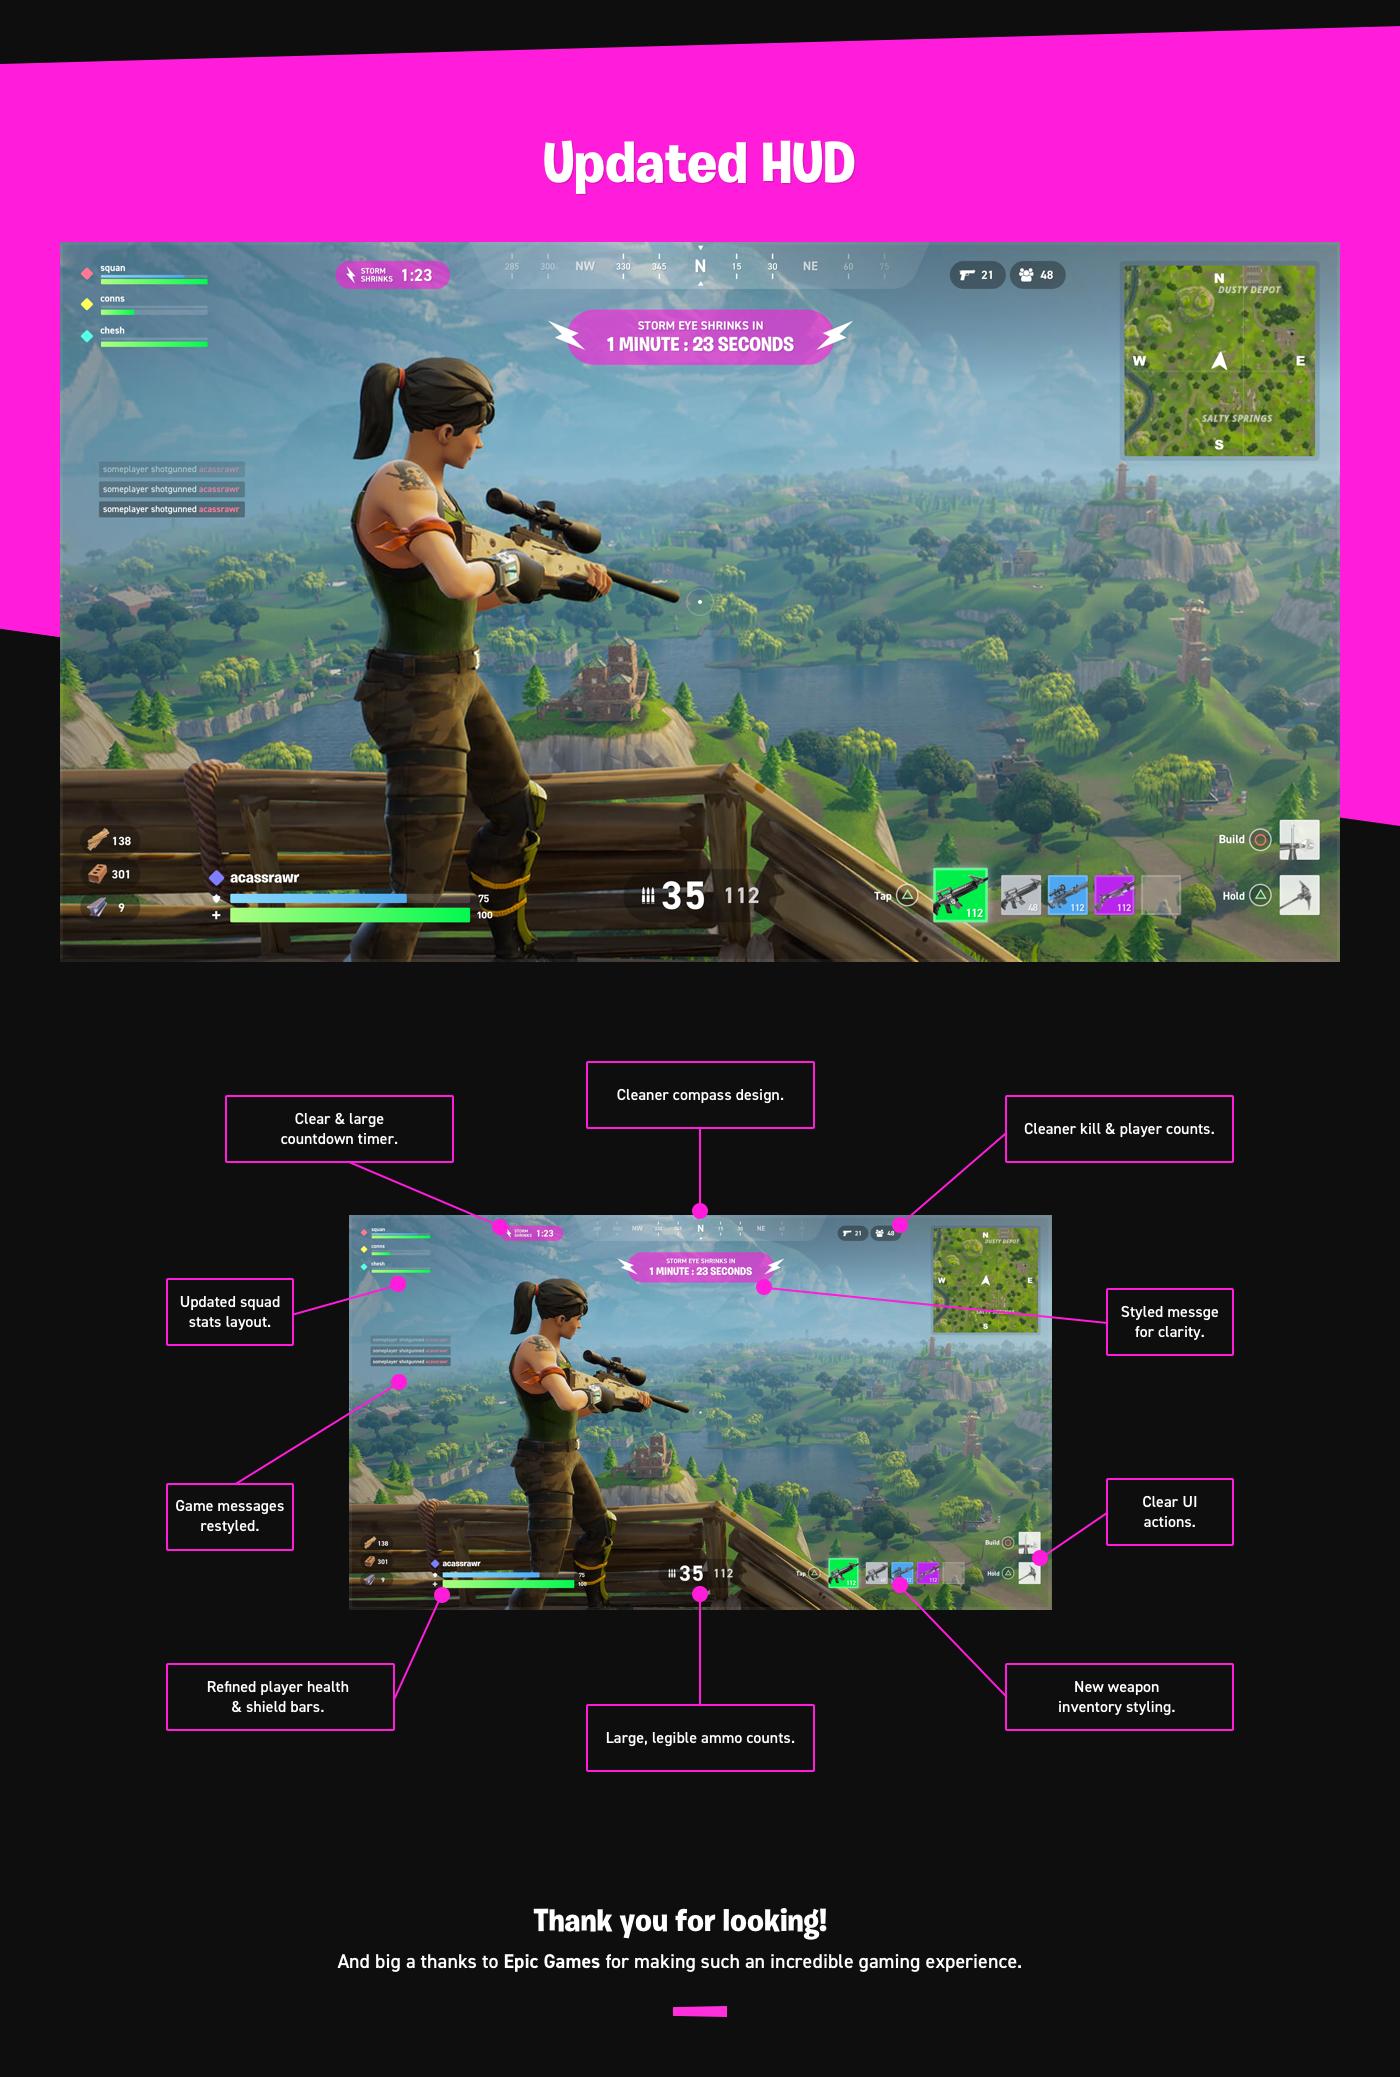 Fortnite Battle Royale Ps4 Conceptual Hud Redesign On Behance Battle Conceptual Fortnite